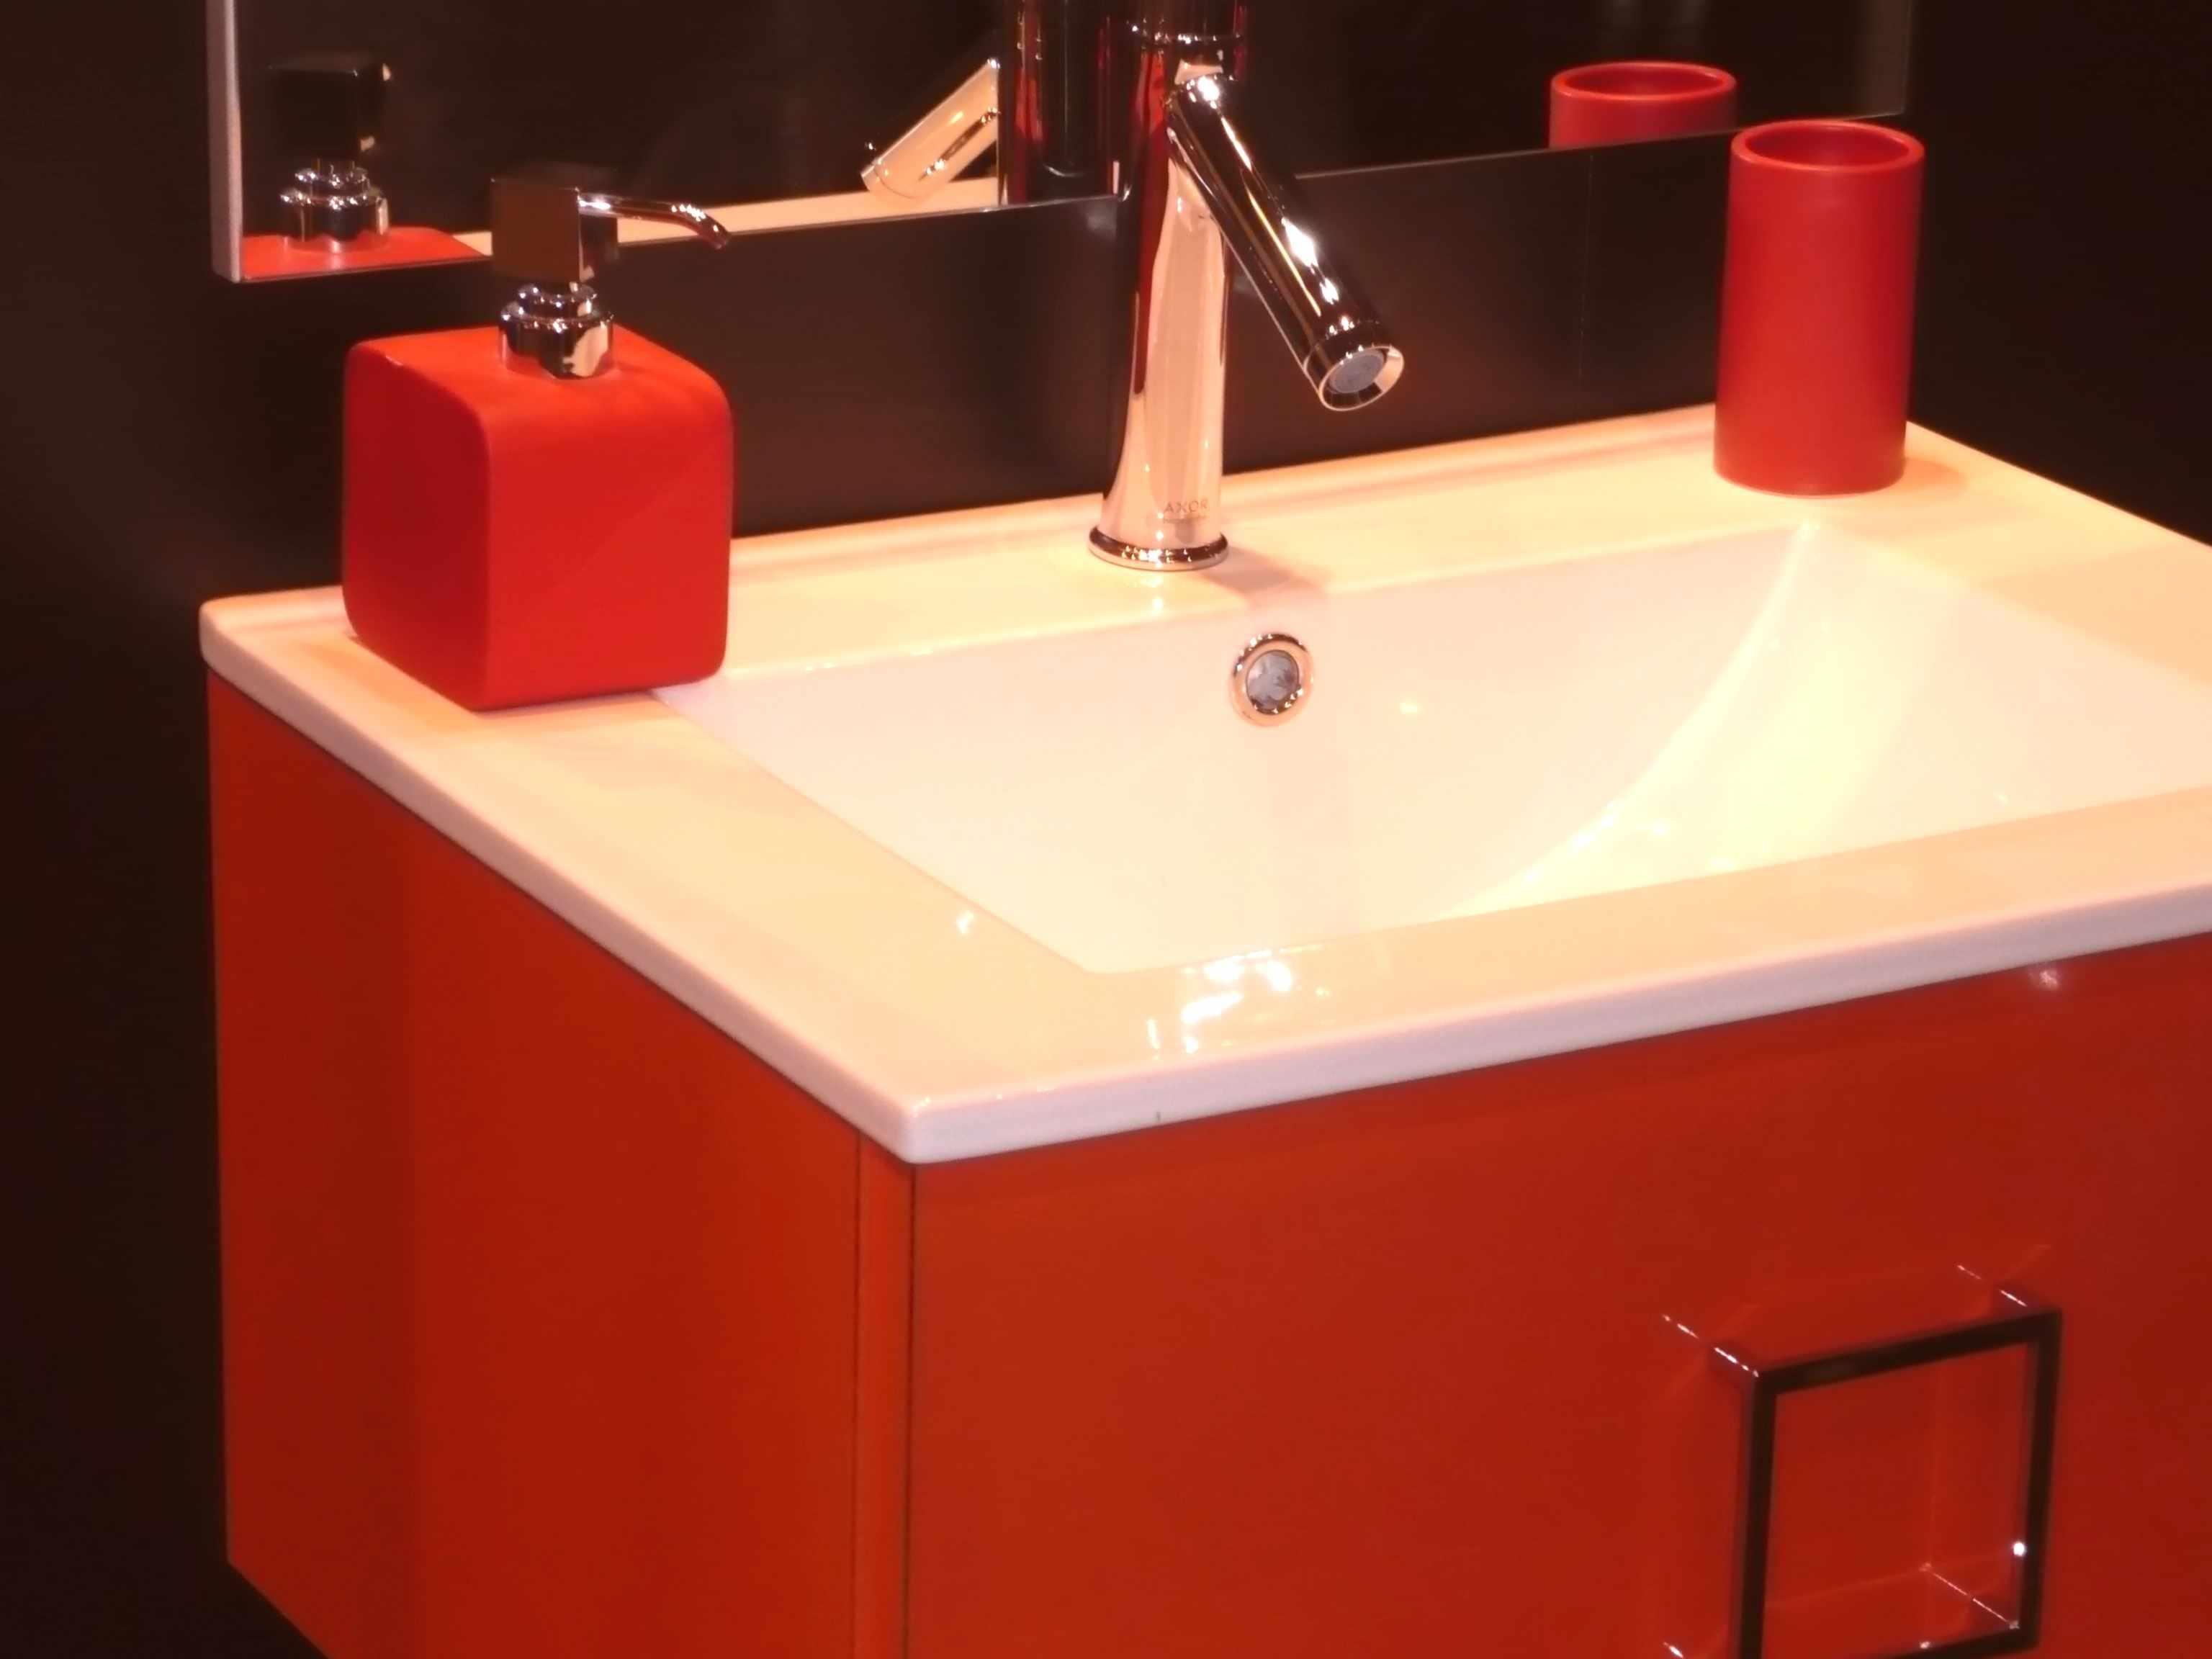 Verriere salle de bain castorama for Salle de bain pop